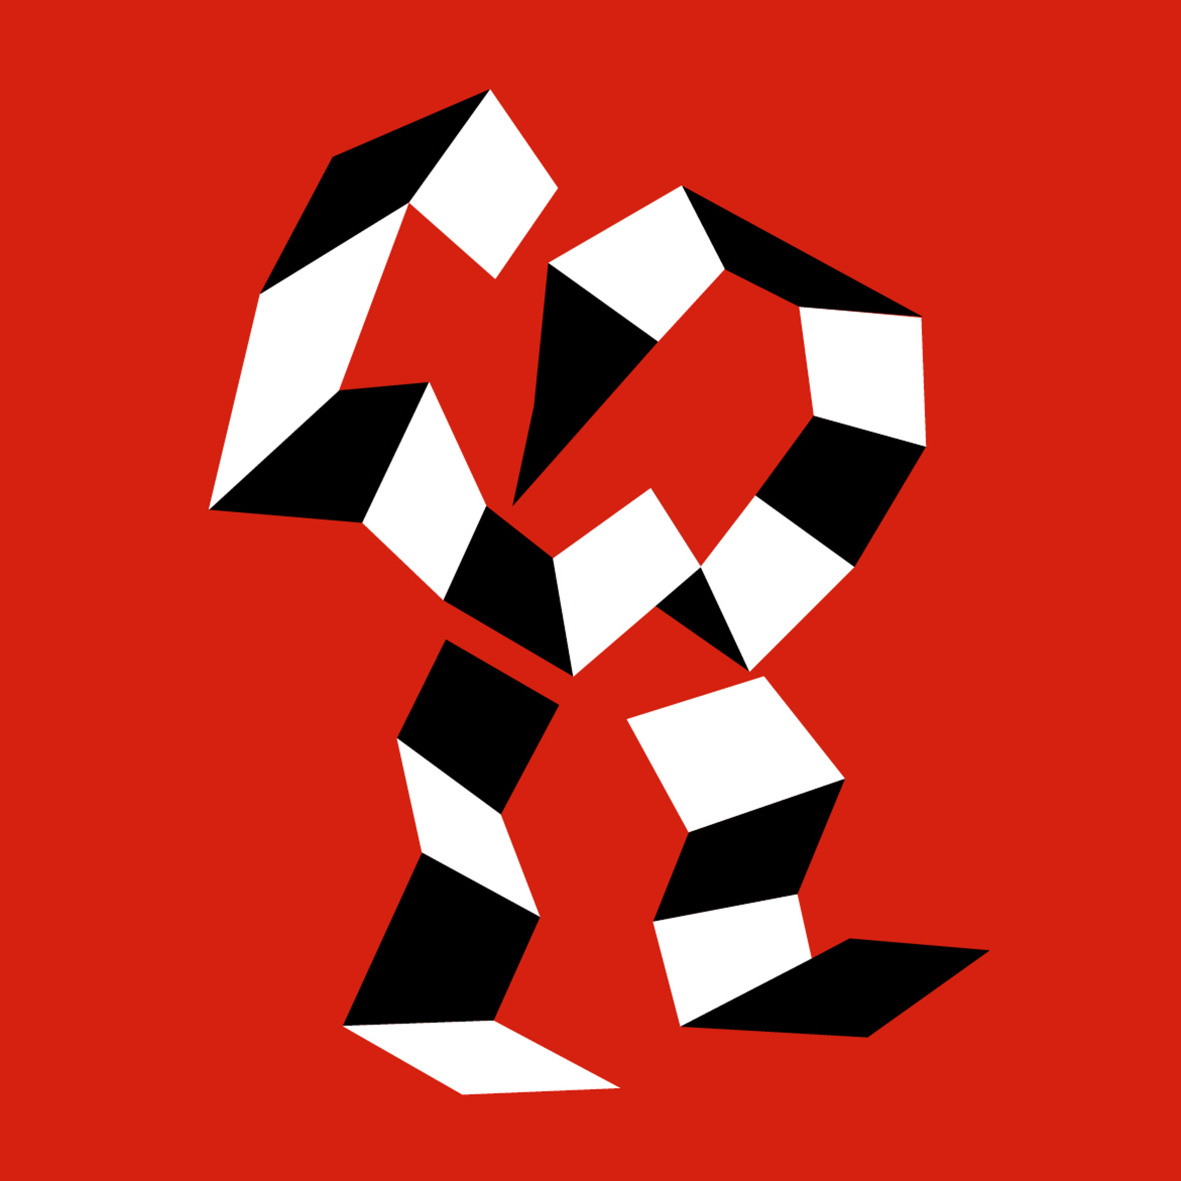 rencontres-philosophiques-monaco-Visuel-Prix